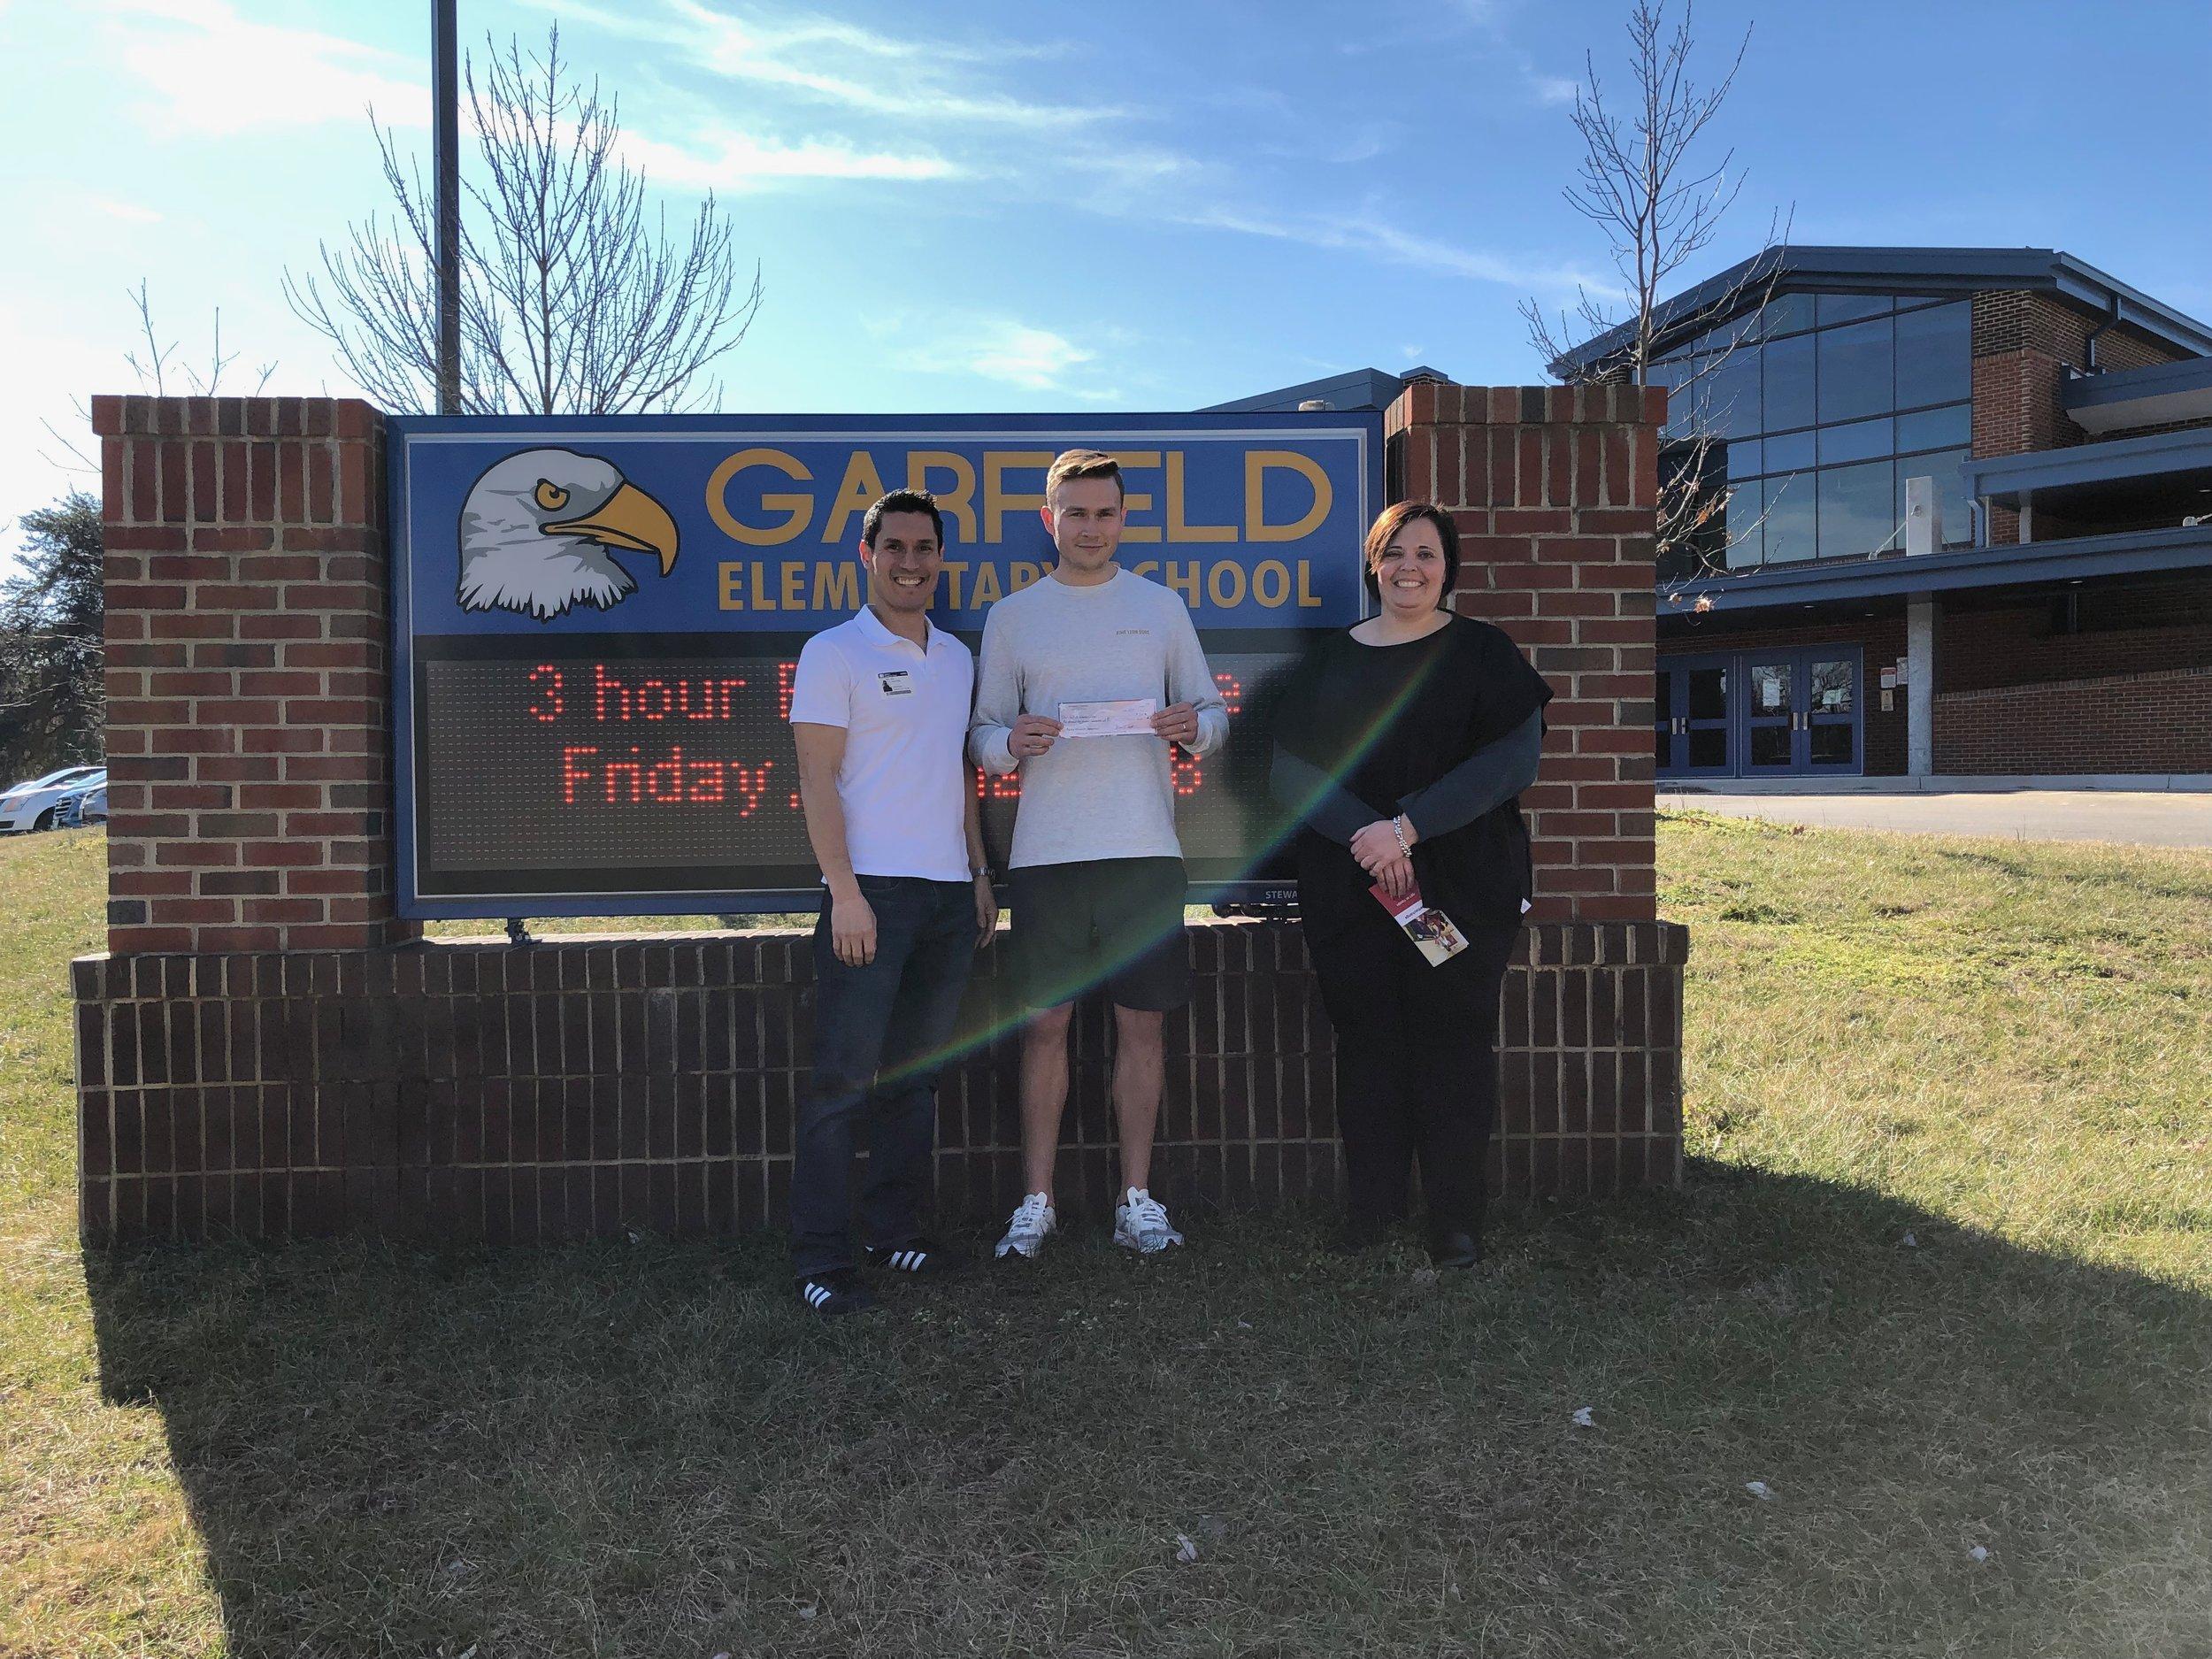 (Left to Right) Ken Savittiere (K12AF & FCFRD), Mr. Geck (PE), Ms. Slattery (Principal)